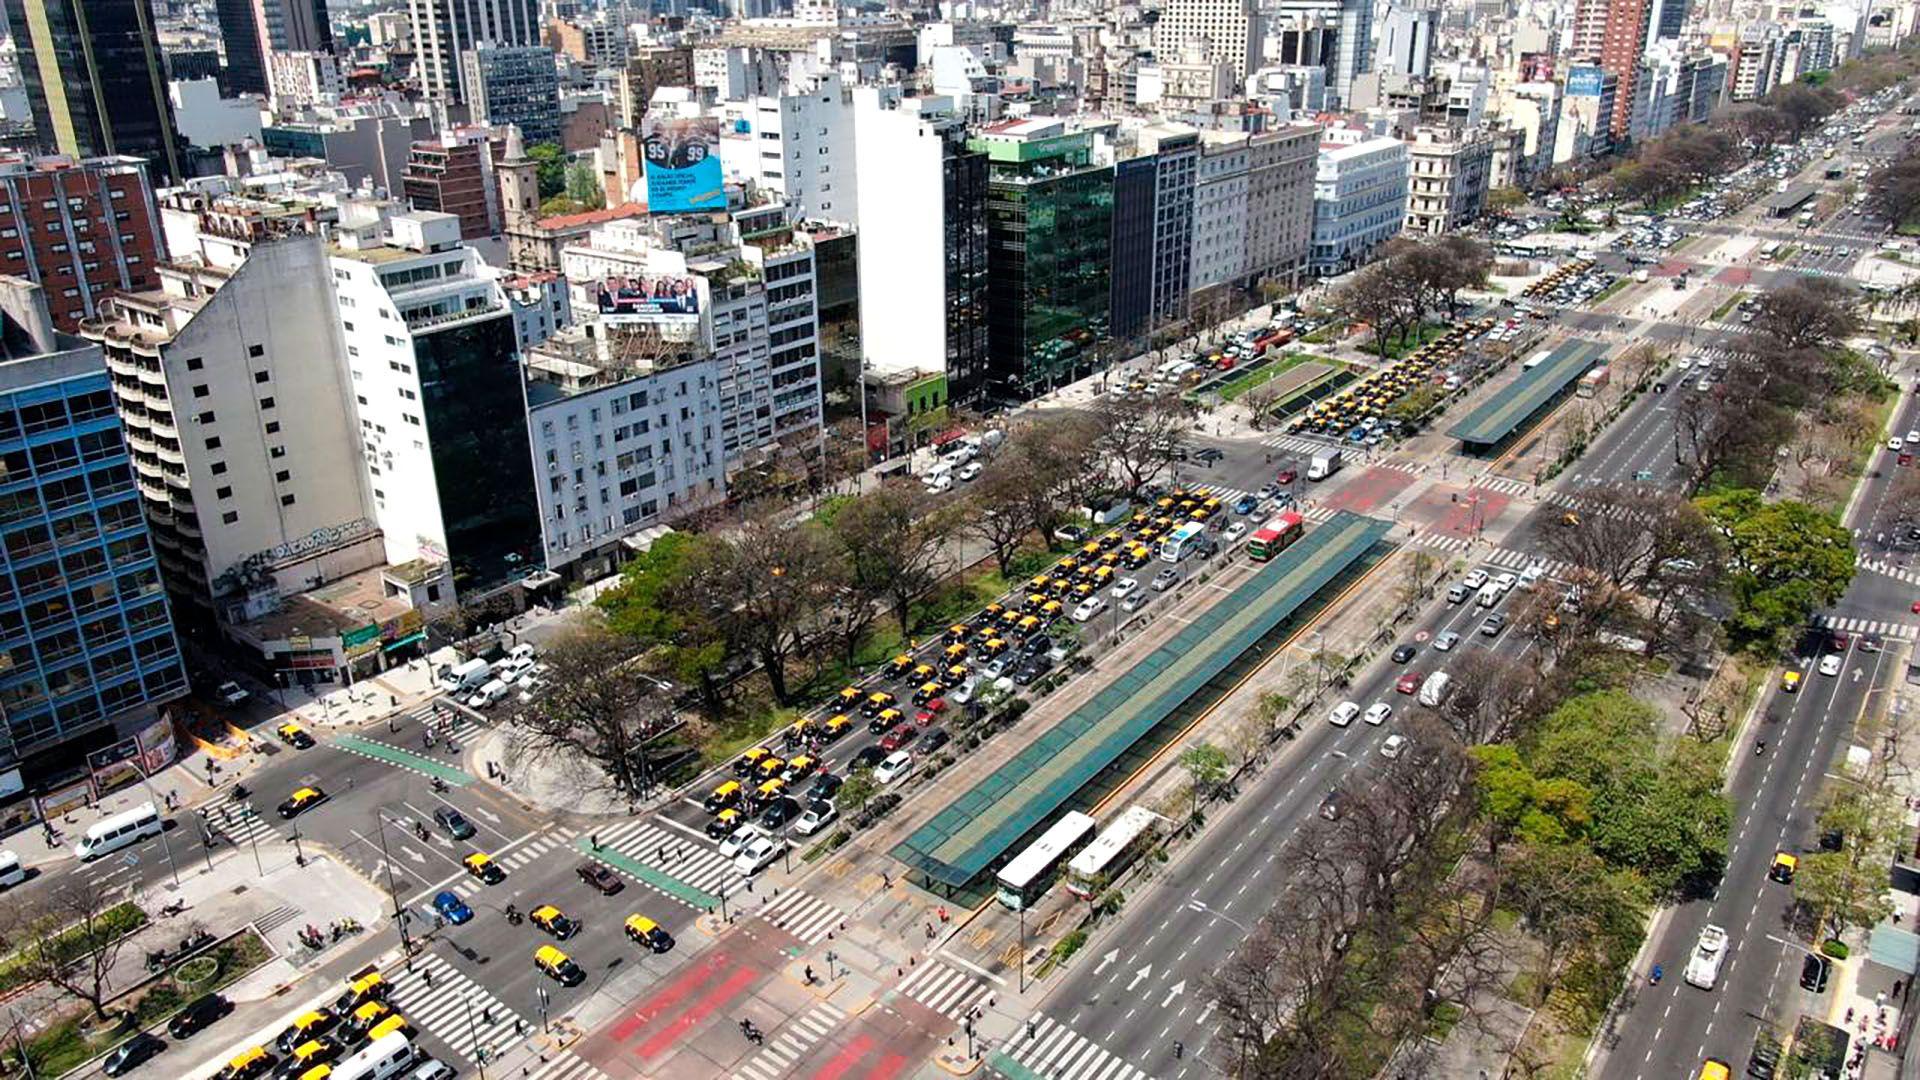 La caravana se dirige a la zona del Obelisco (fotos: Thomas Khazki)